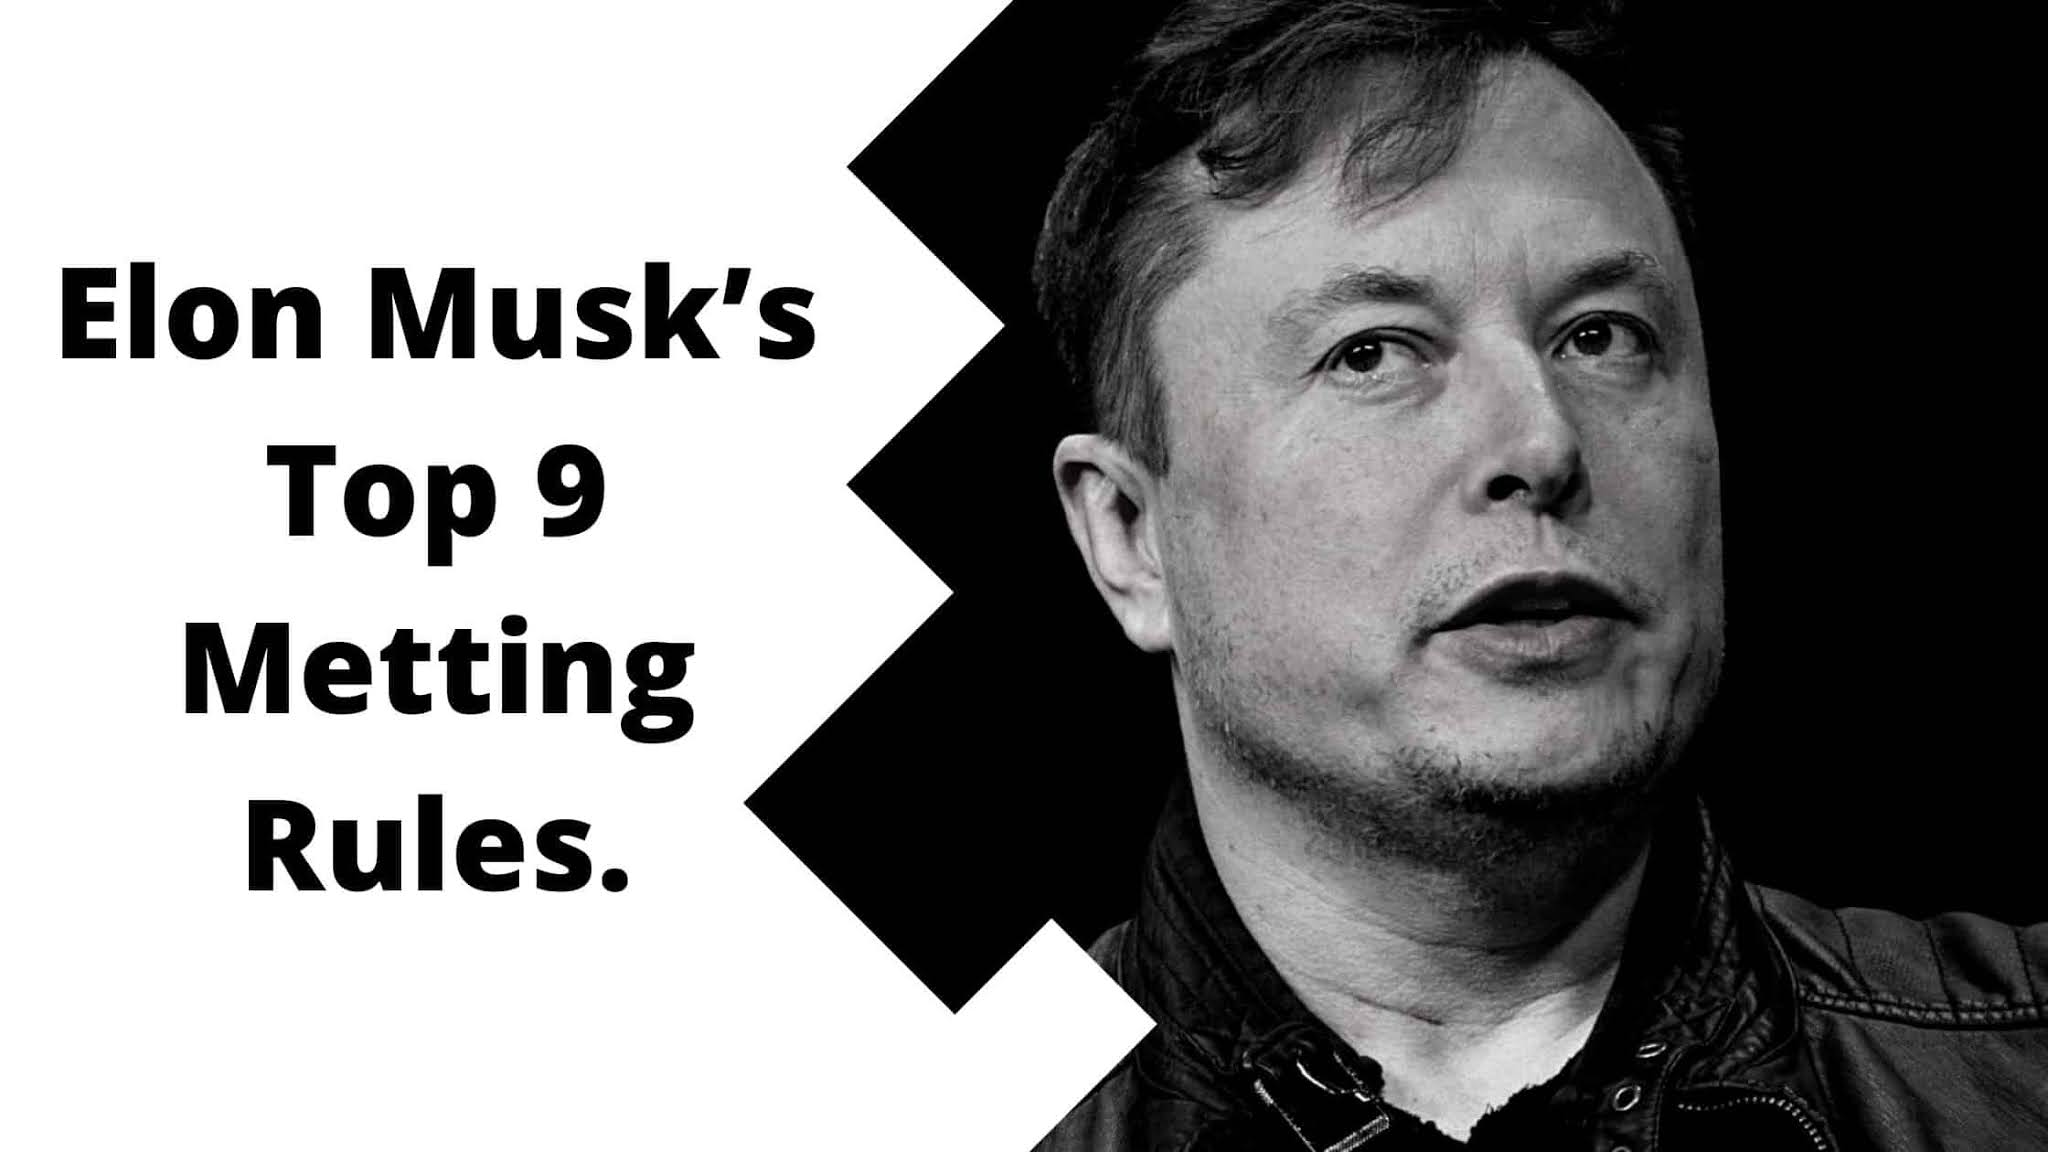 Elon Musk's Top 9 Metting Rules